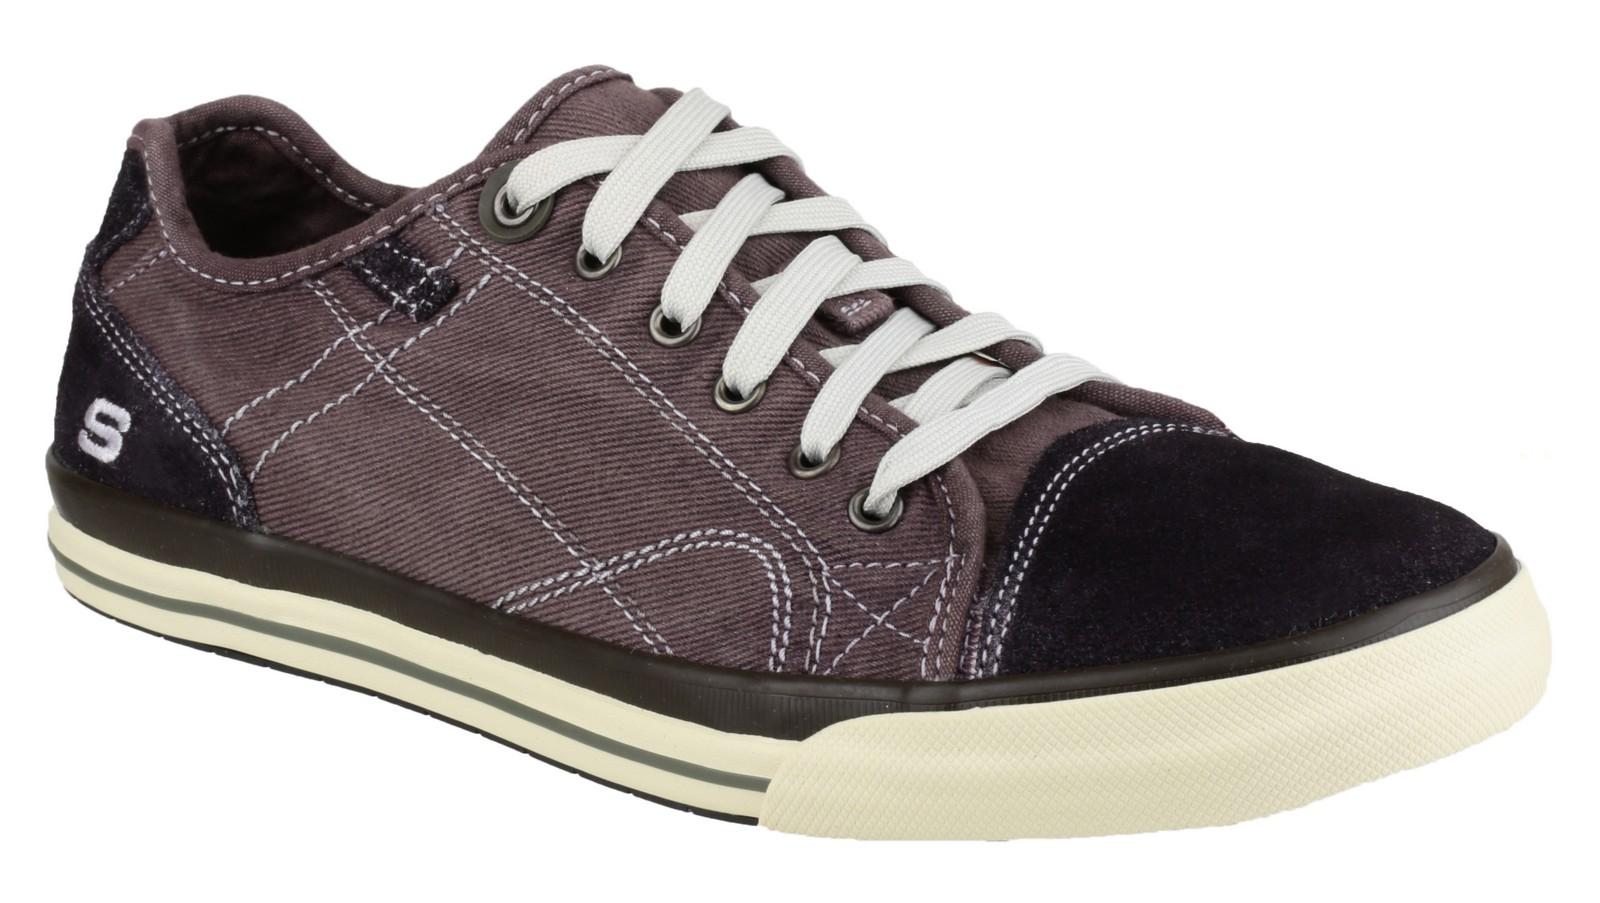 680bbc5b6401 Skechers Diamond Back Levon Men s Shoes